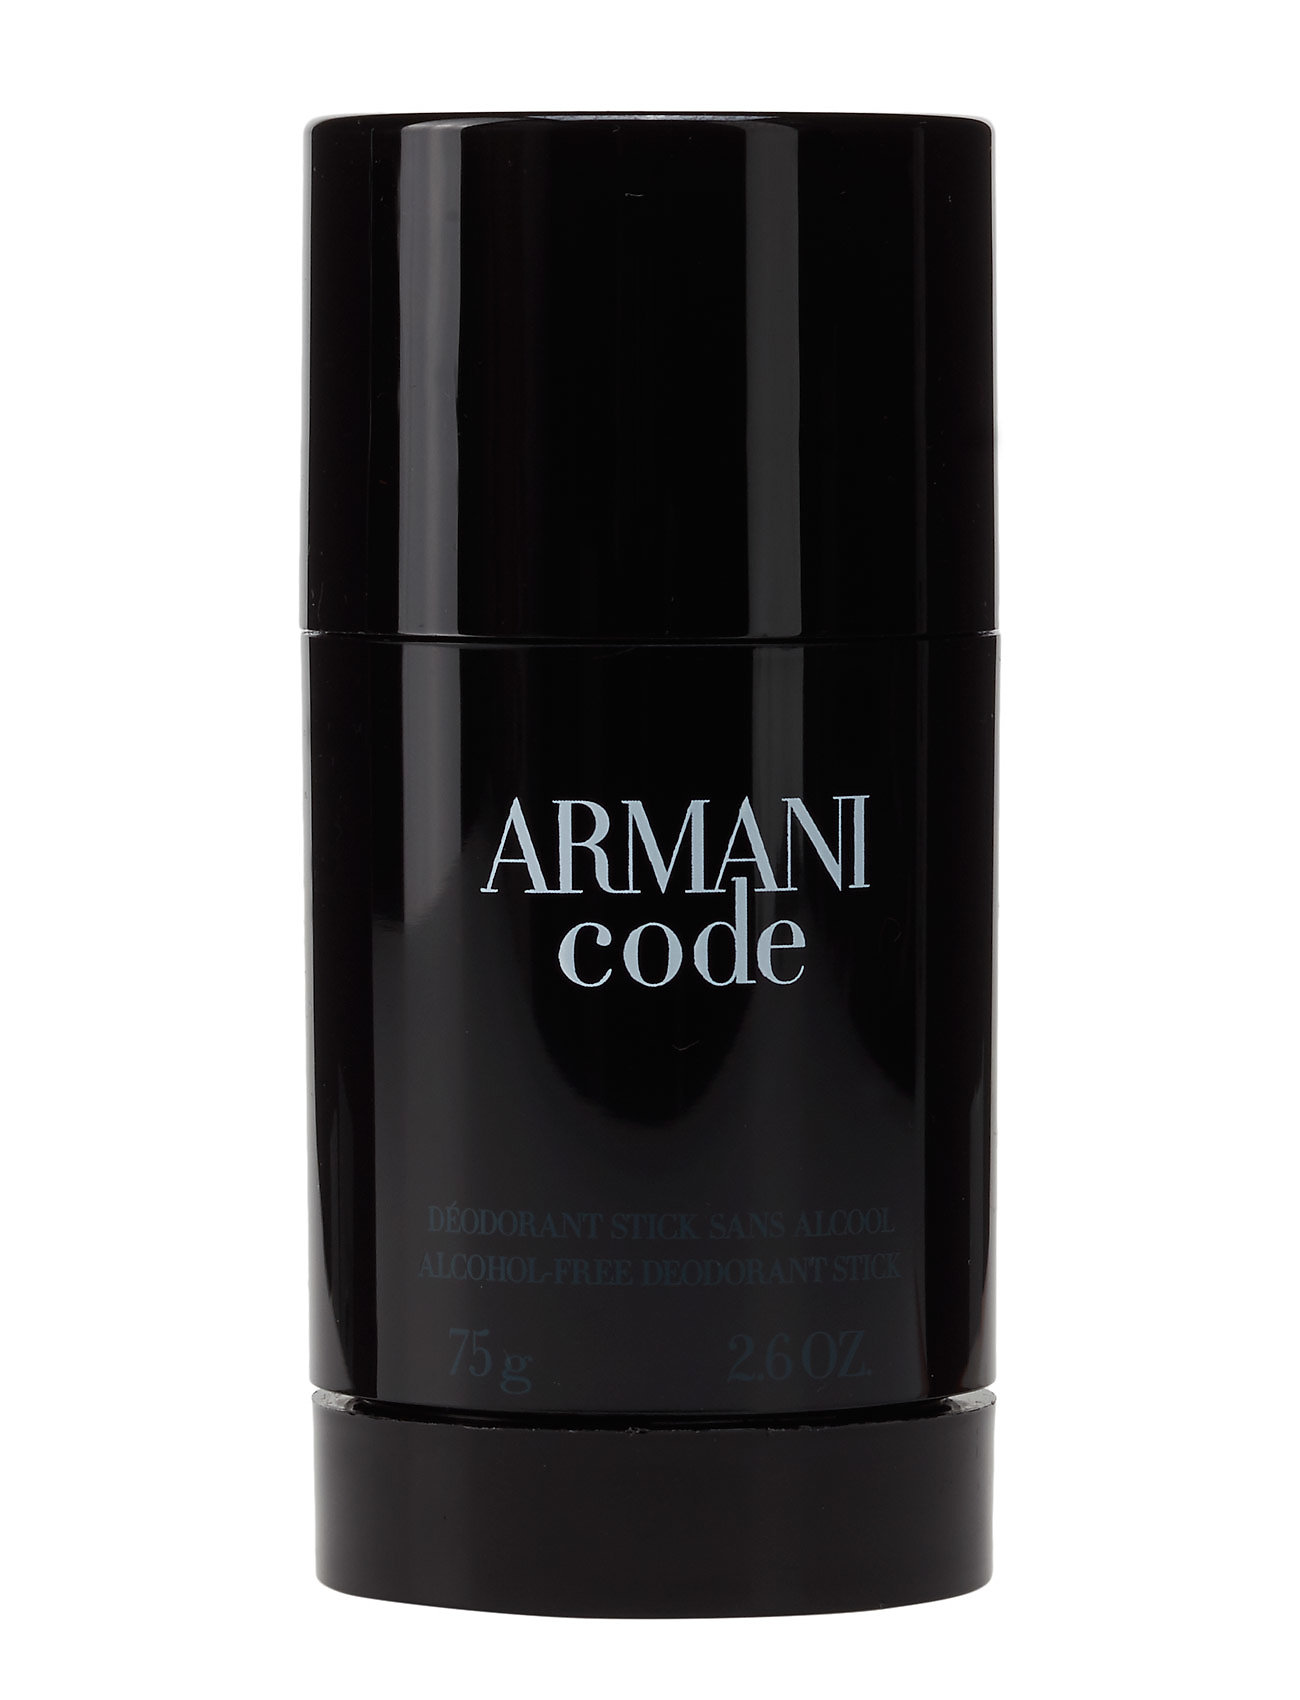 Armani Code Men Deostick 75 Ml Giorgio Armani #I/T til Mænd i